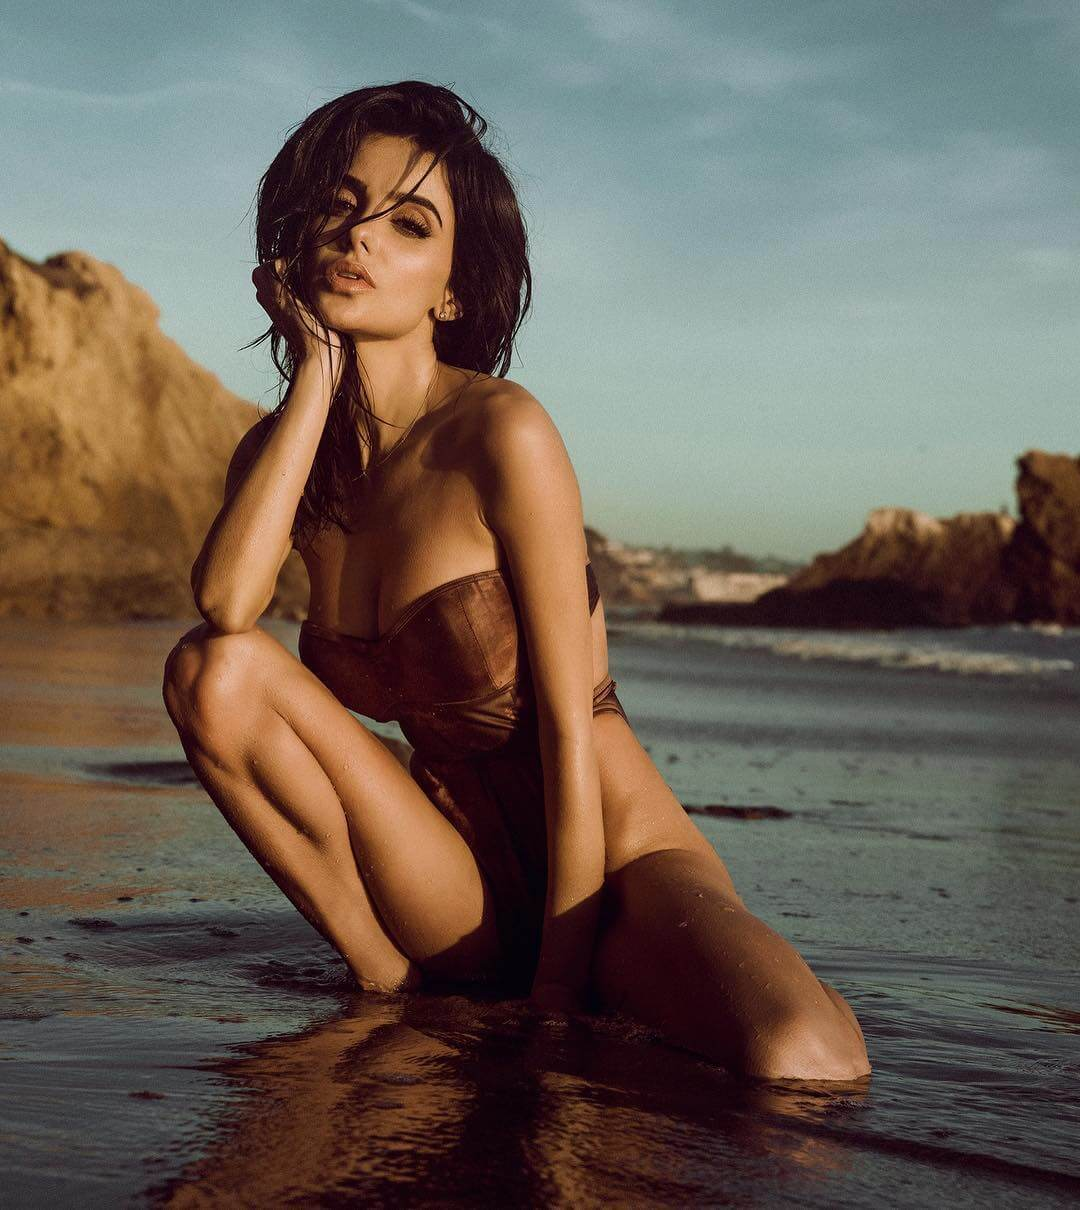 Mikaela Hoover sexy lingerie pics